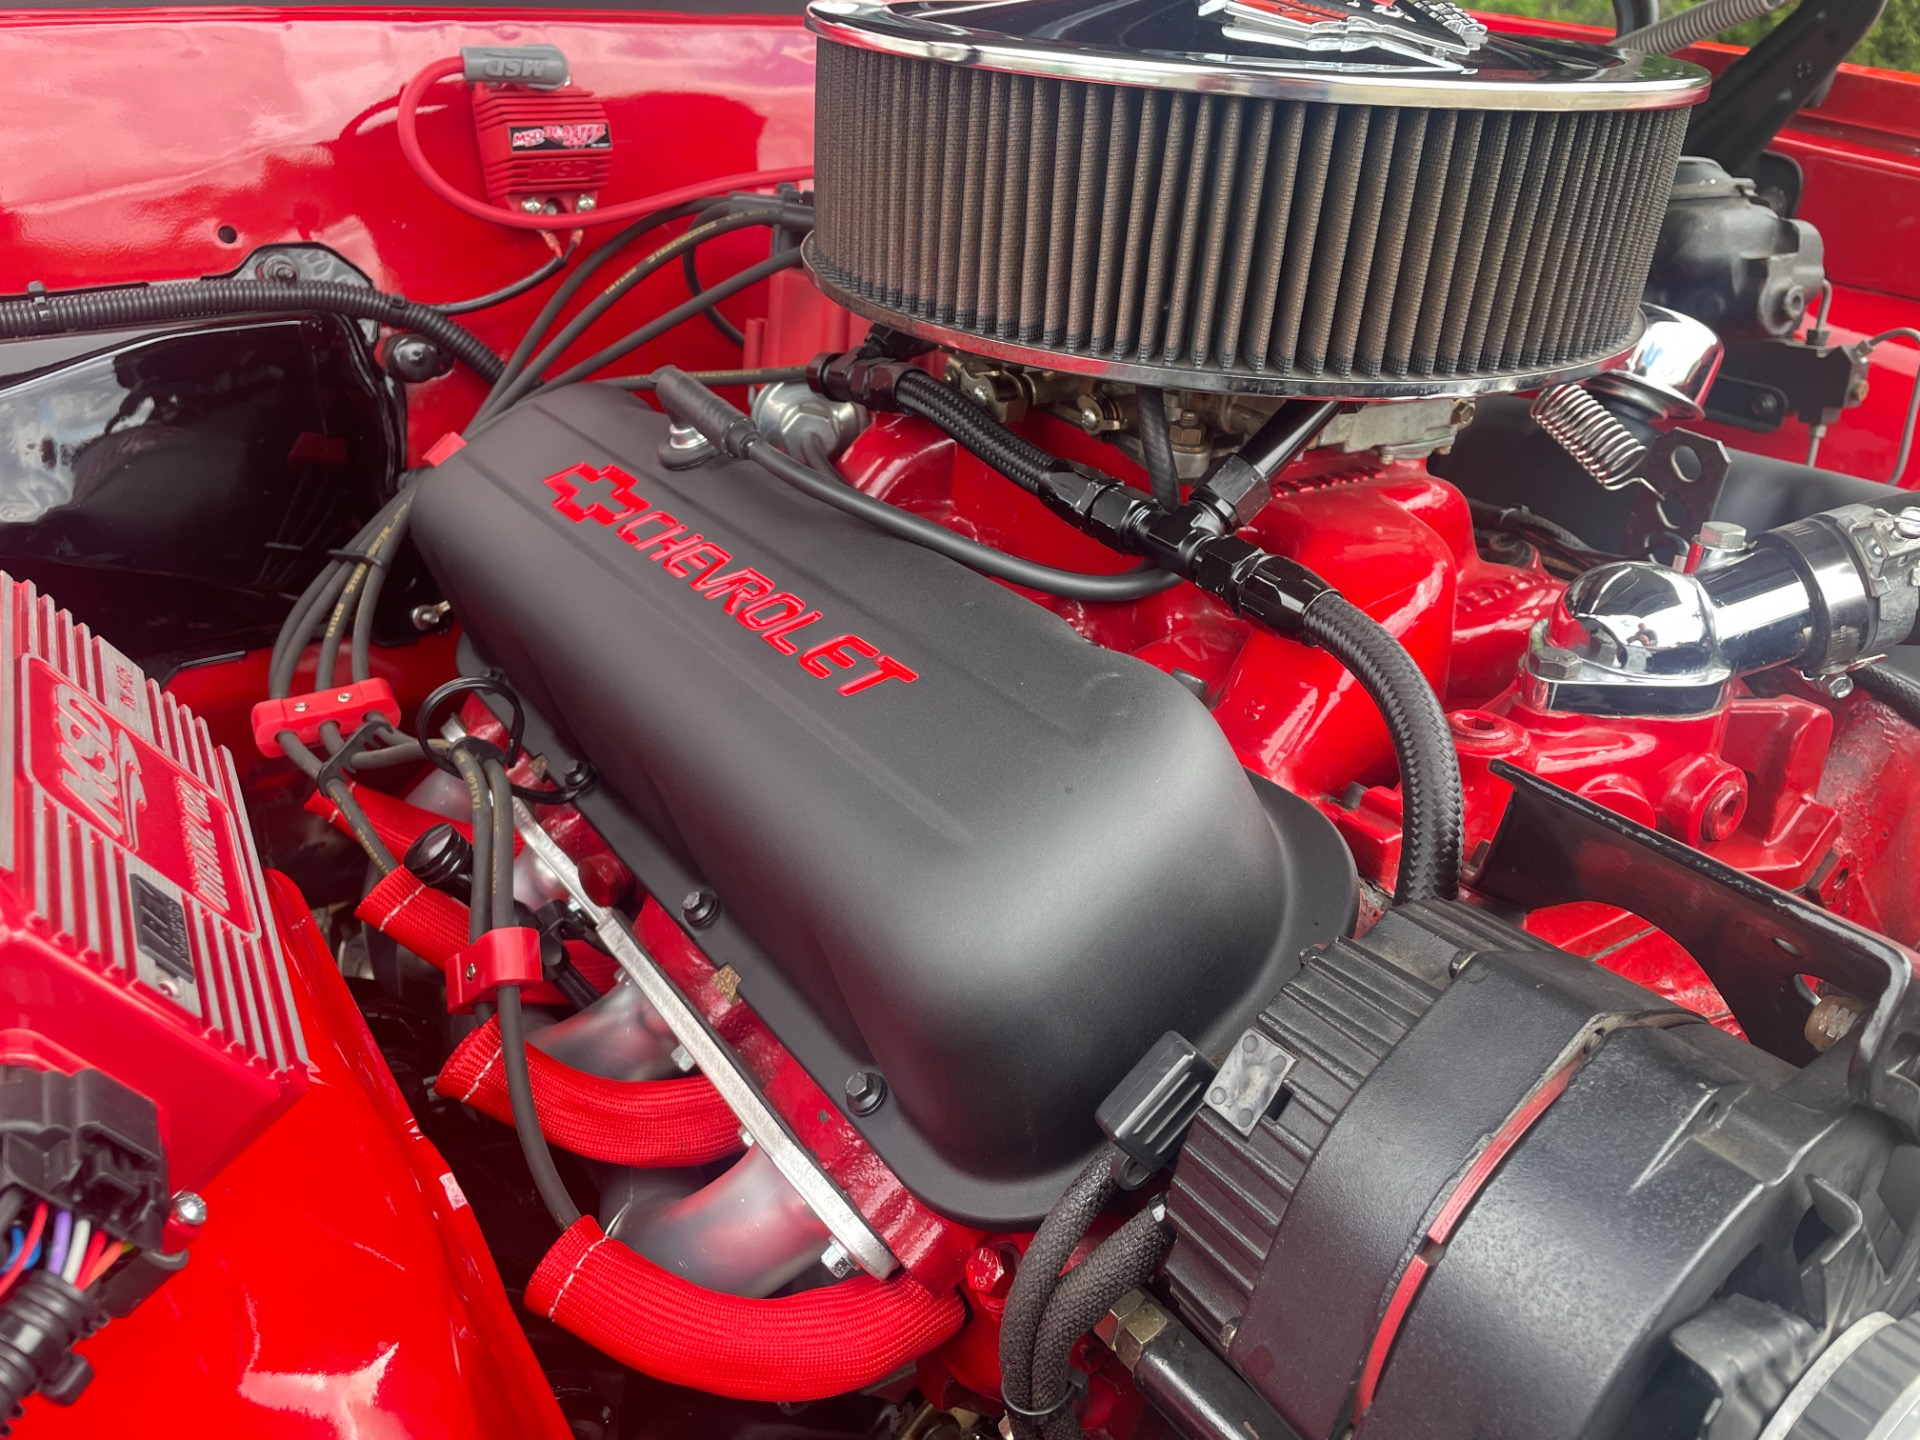 Used 1966 Chevrolet Chevelle -300 DELUXE SEDAN - 454 ENGINE - 4 SPEED MAUNAL - | Mundelein, IL